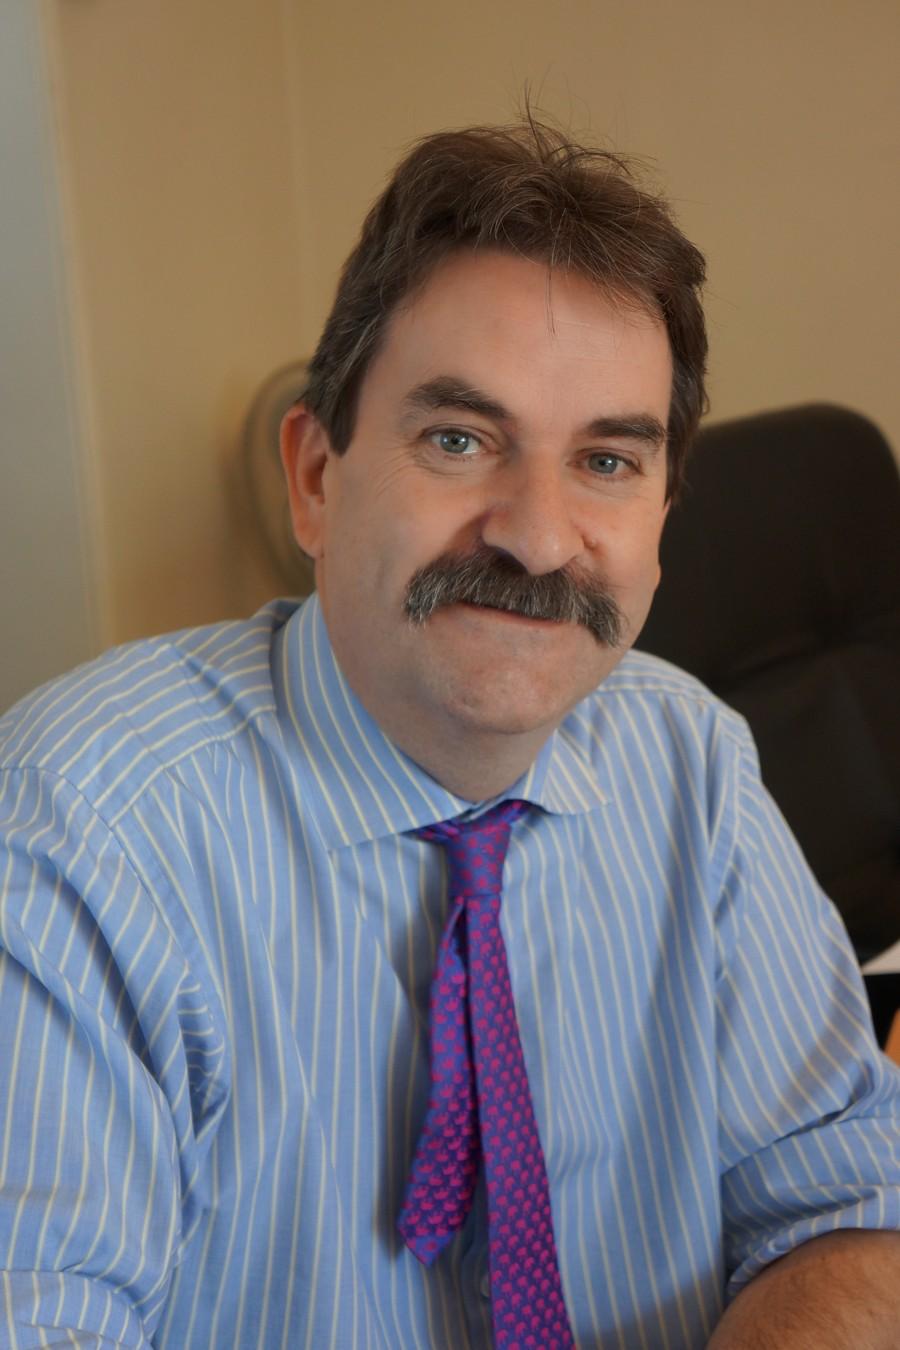 Mr Hulbert - Headteacher